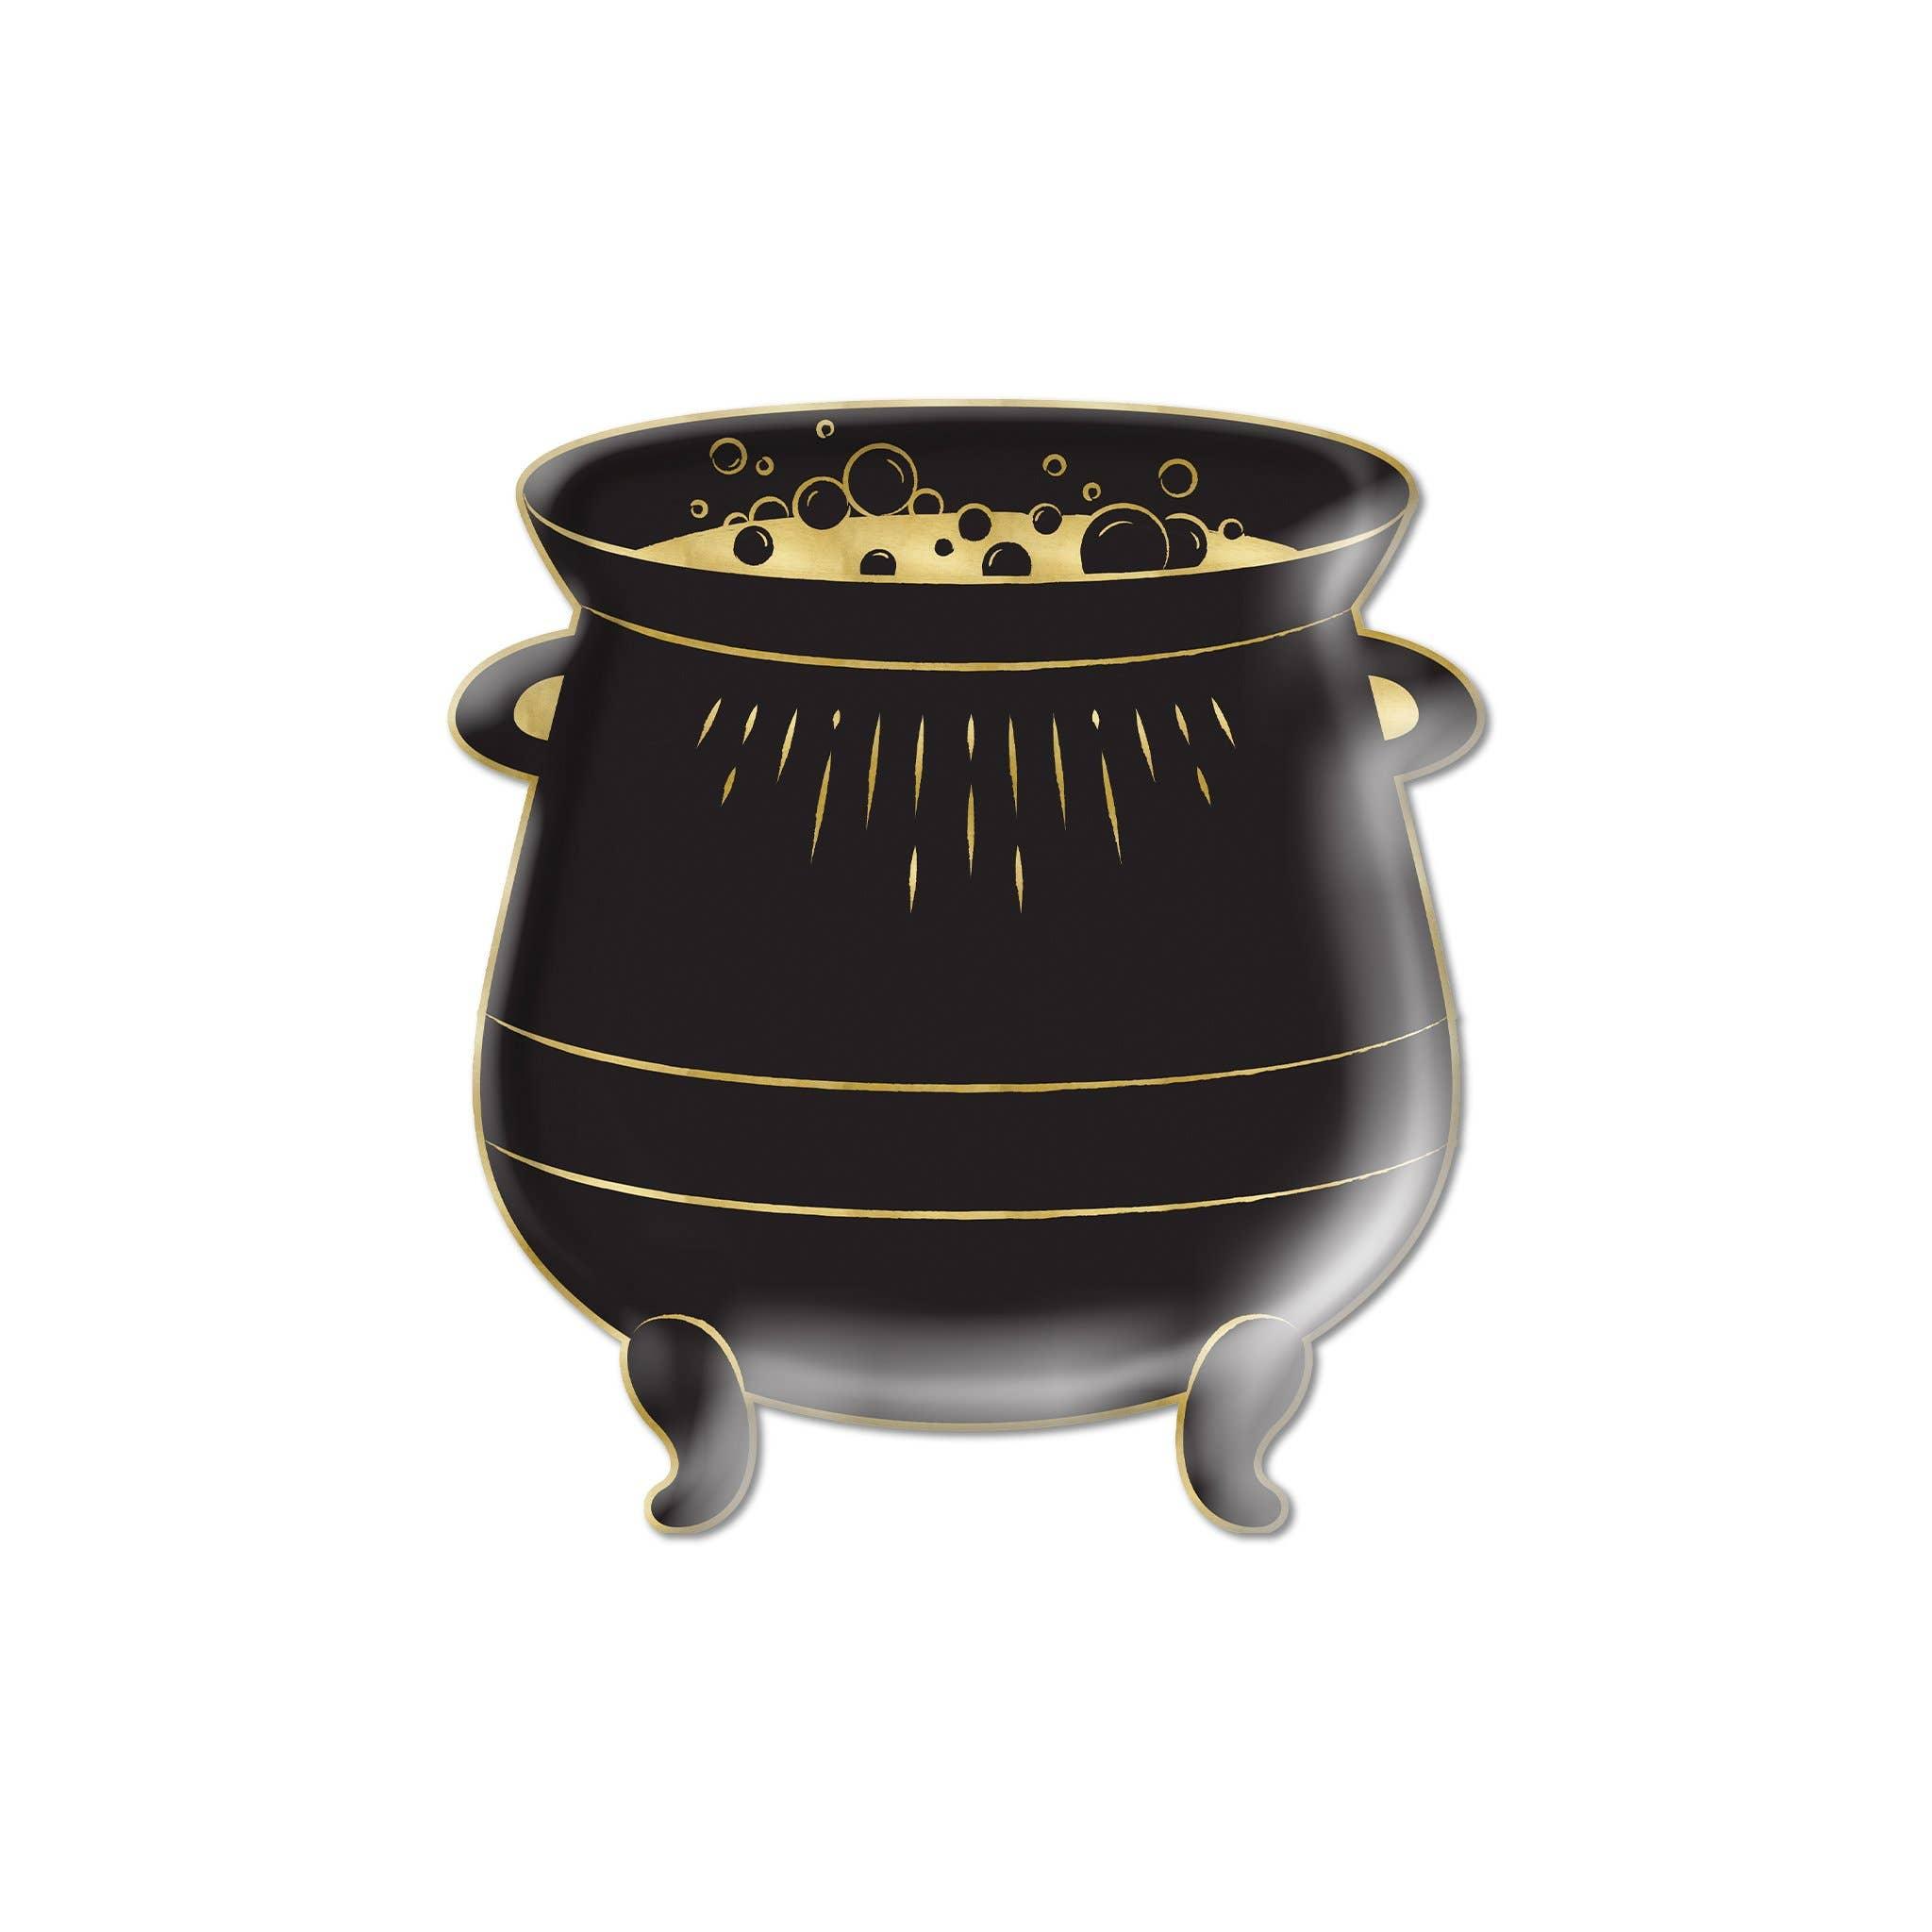 "Spellbound Cauldron Shaped 9"" Plate"